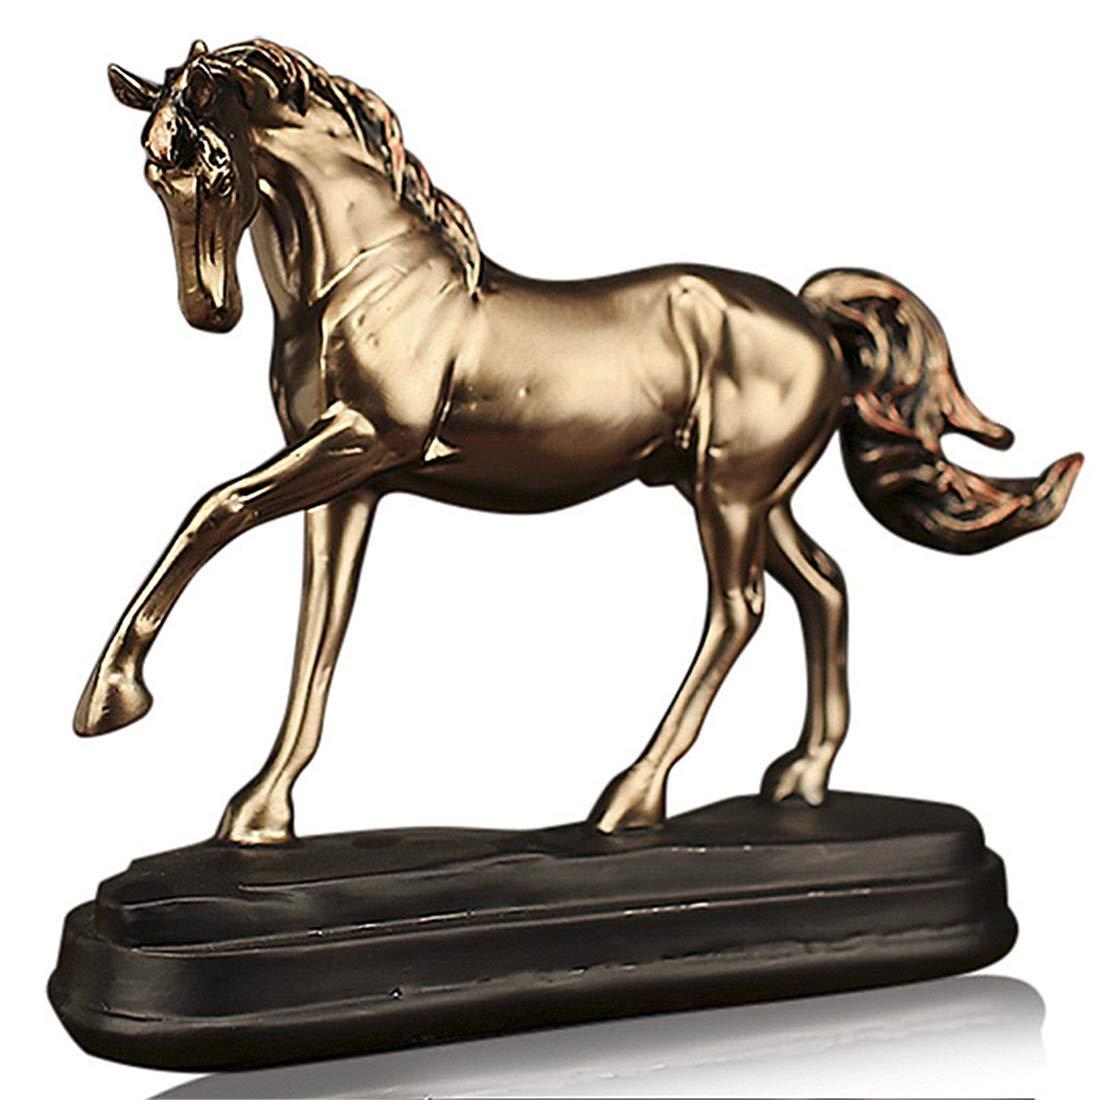 Moderne Harz Skulptur Skulptur Skulptur Artwork Home Dekoration Goldenes Pferd Treten - Kreative Figuren Desktop Ornamente Statue Auto Wohnzimmer Cafe Bar Decor Kinder Geschenke bd9319